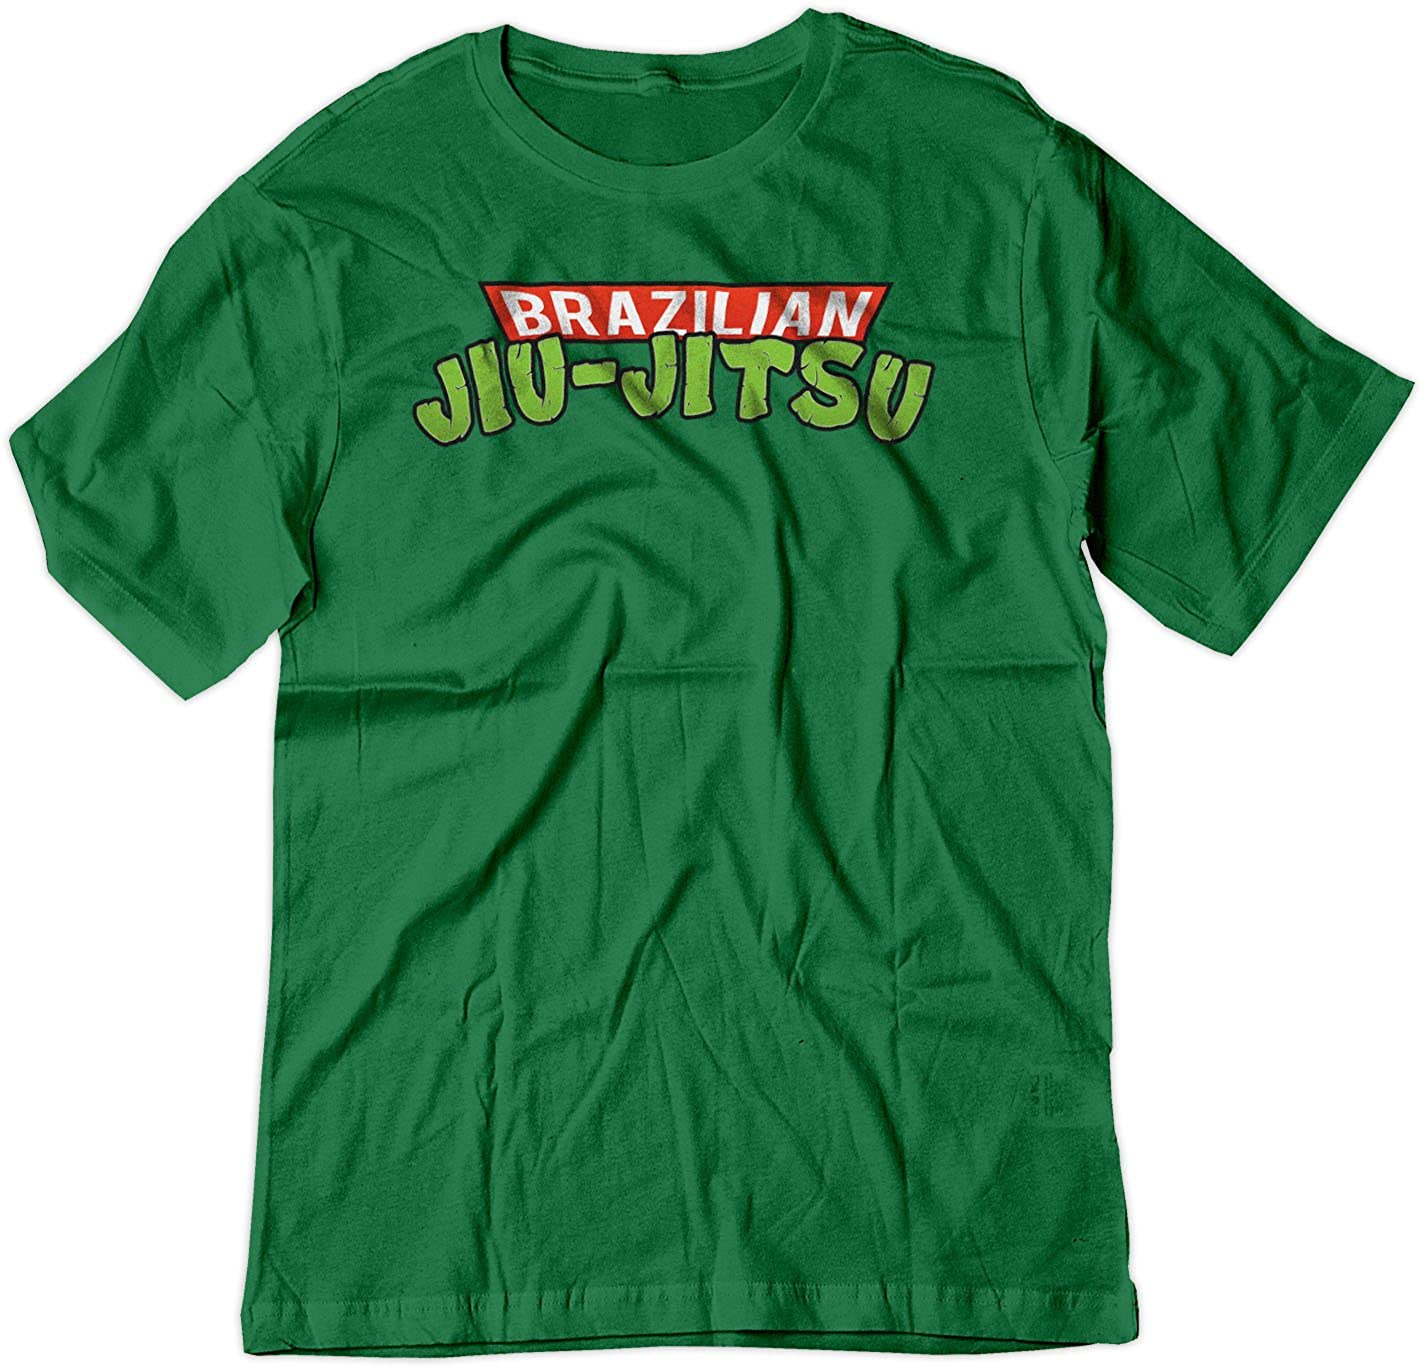 BSW YOUTH Brazilian Jiu-Jitsu Teenage Mutant Ninja Turtles Shirt 5169-1Y